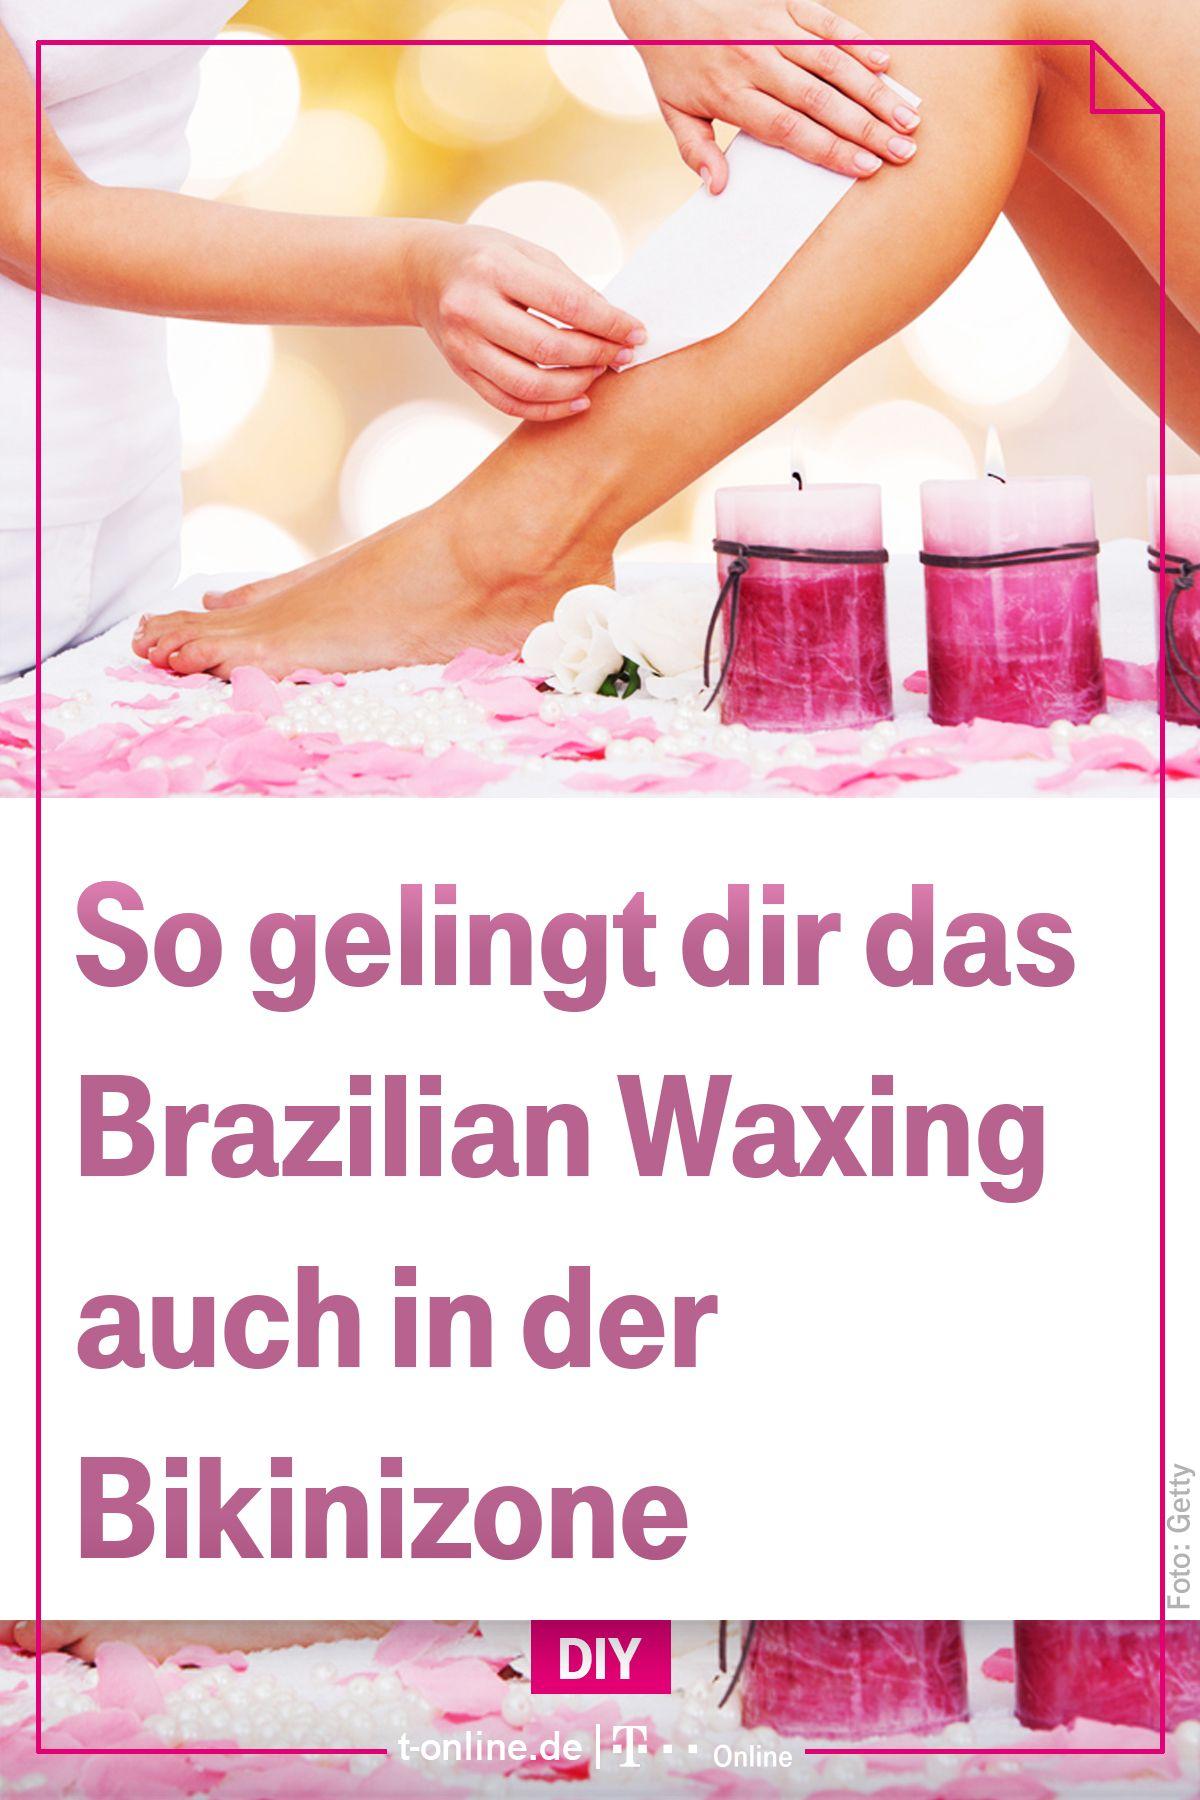 Brazilian Waxing Wird Auch In Deutschland Immer Beliebter Wir Zeigen Wie Die Haarentfernung Auf Brasilianische Art Gelin Brazilian Waxing Enthaarung Enthaaren